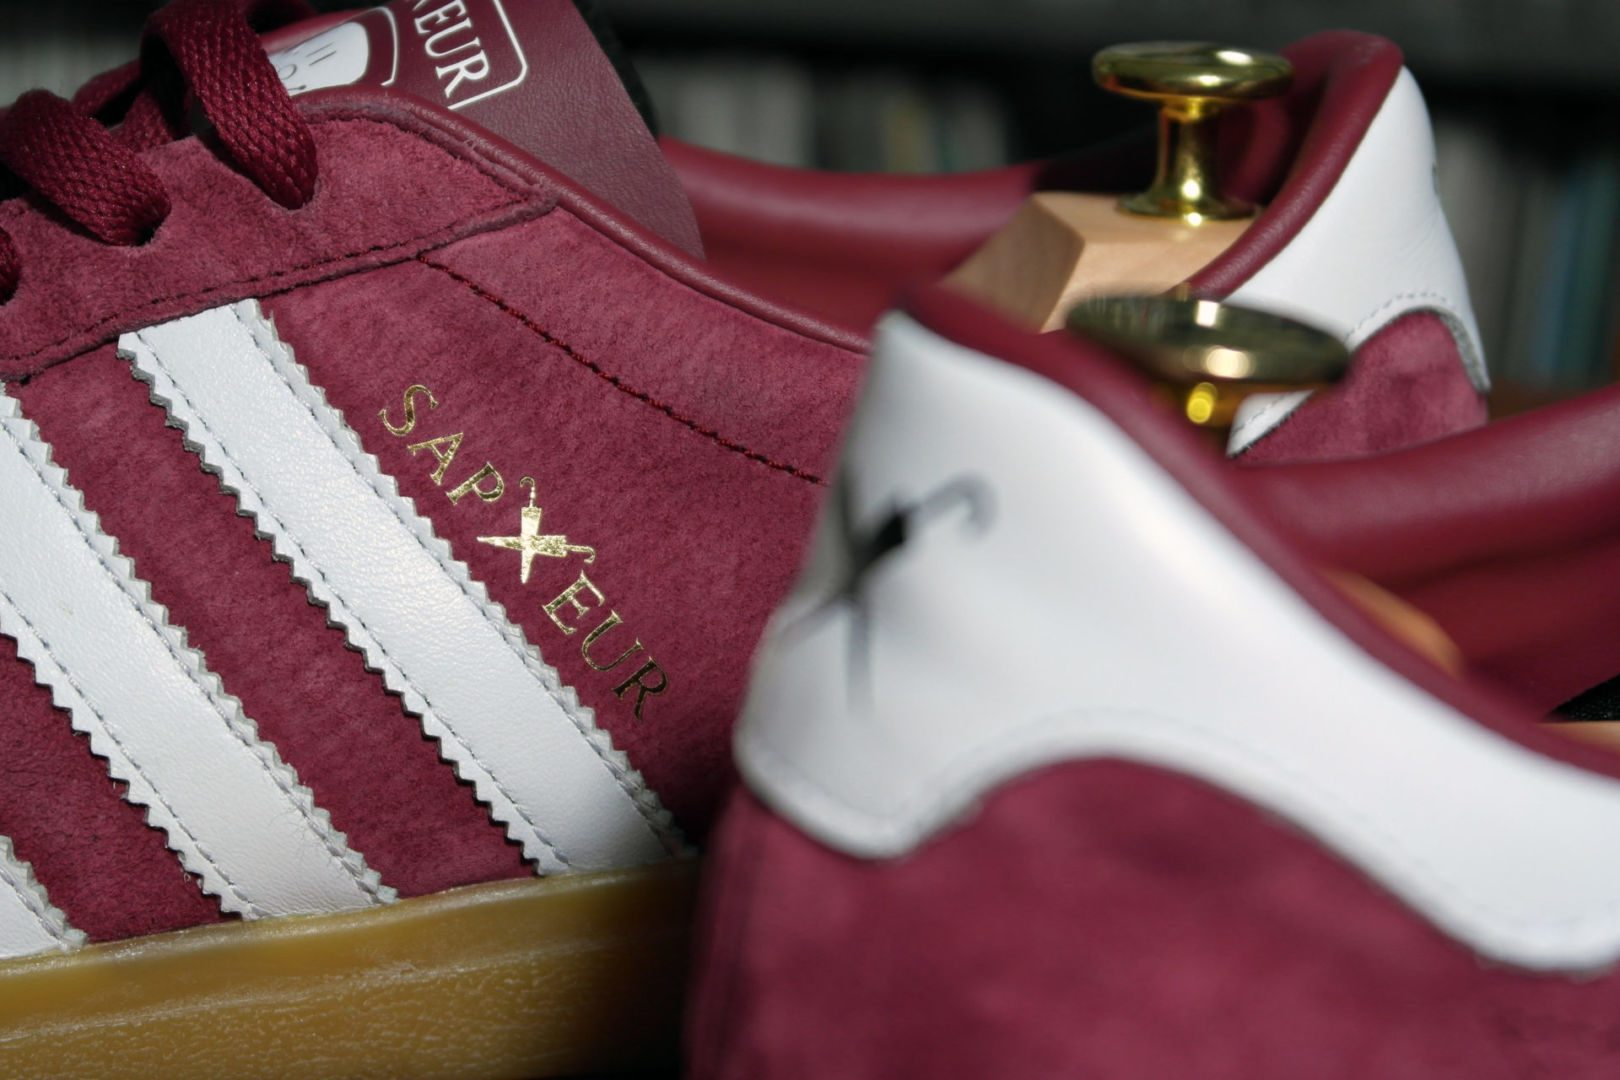 Sapeur OSB im Gespräch: Benji Blunt, Sneaker Kunsthandwerker